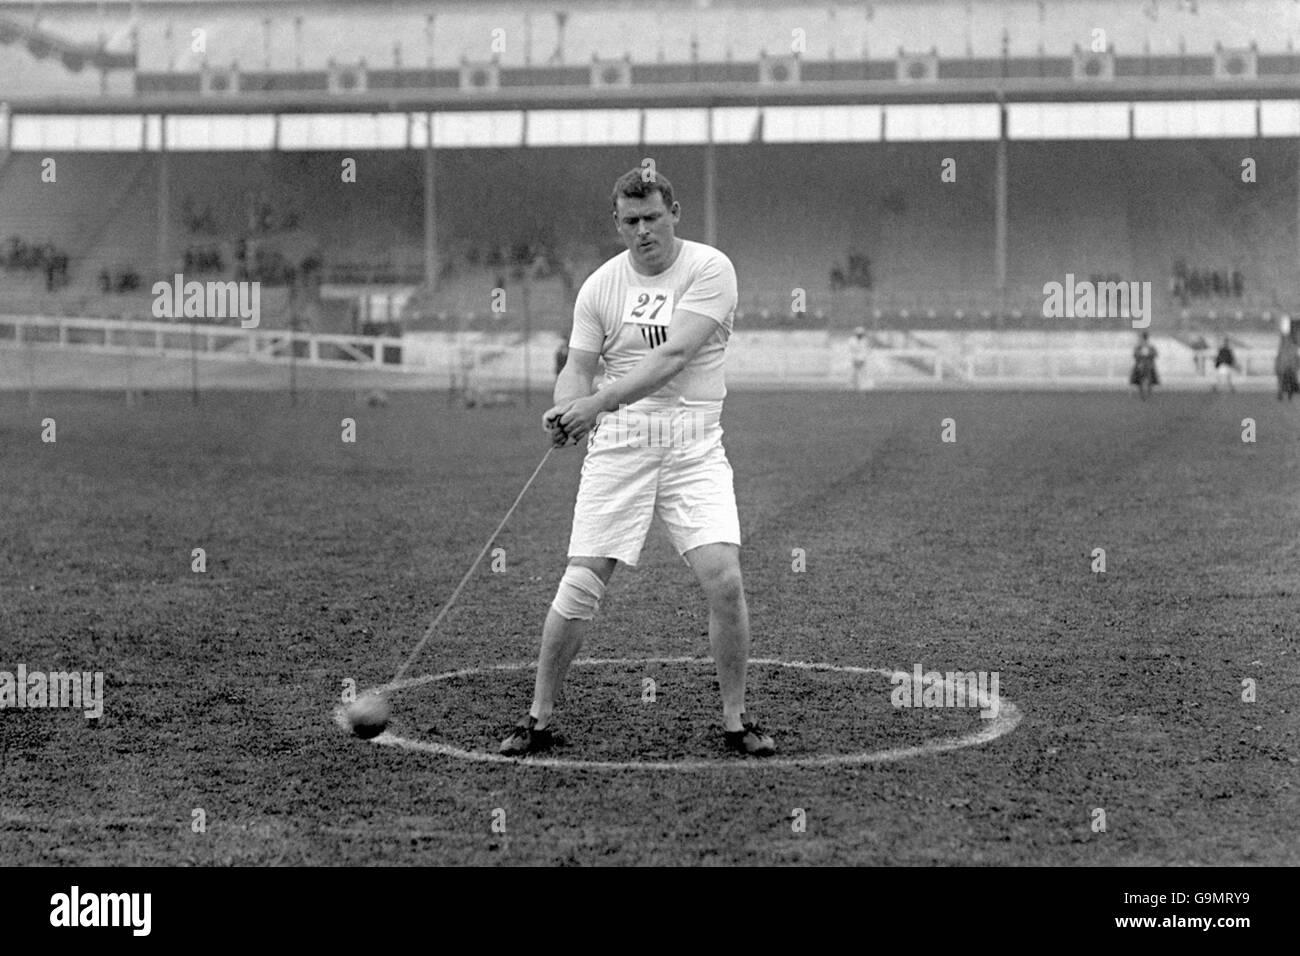 Athletics - London Olympic Games 1908 - Hammer - White City Stock Photo